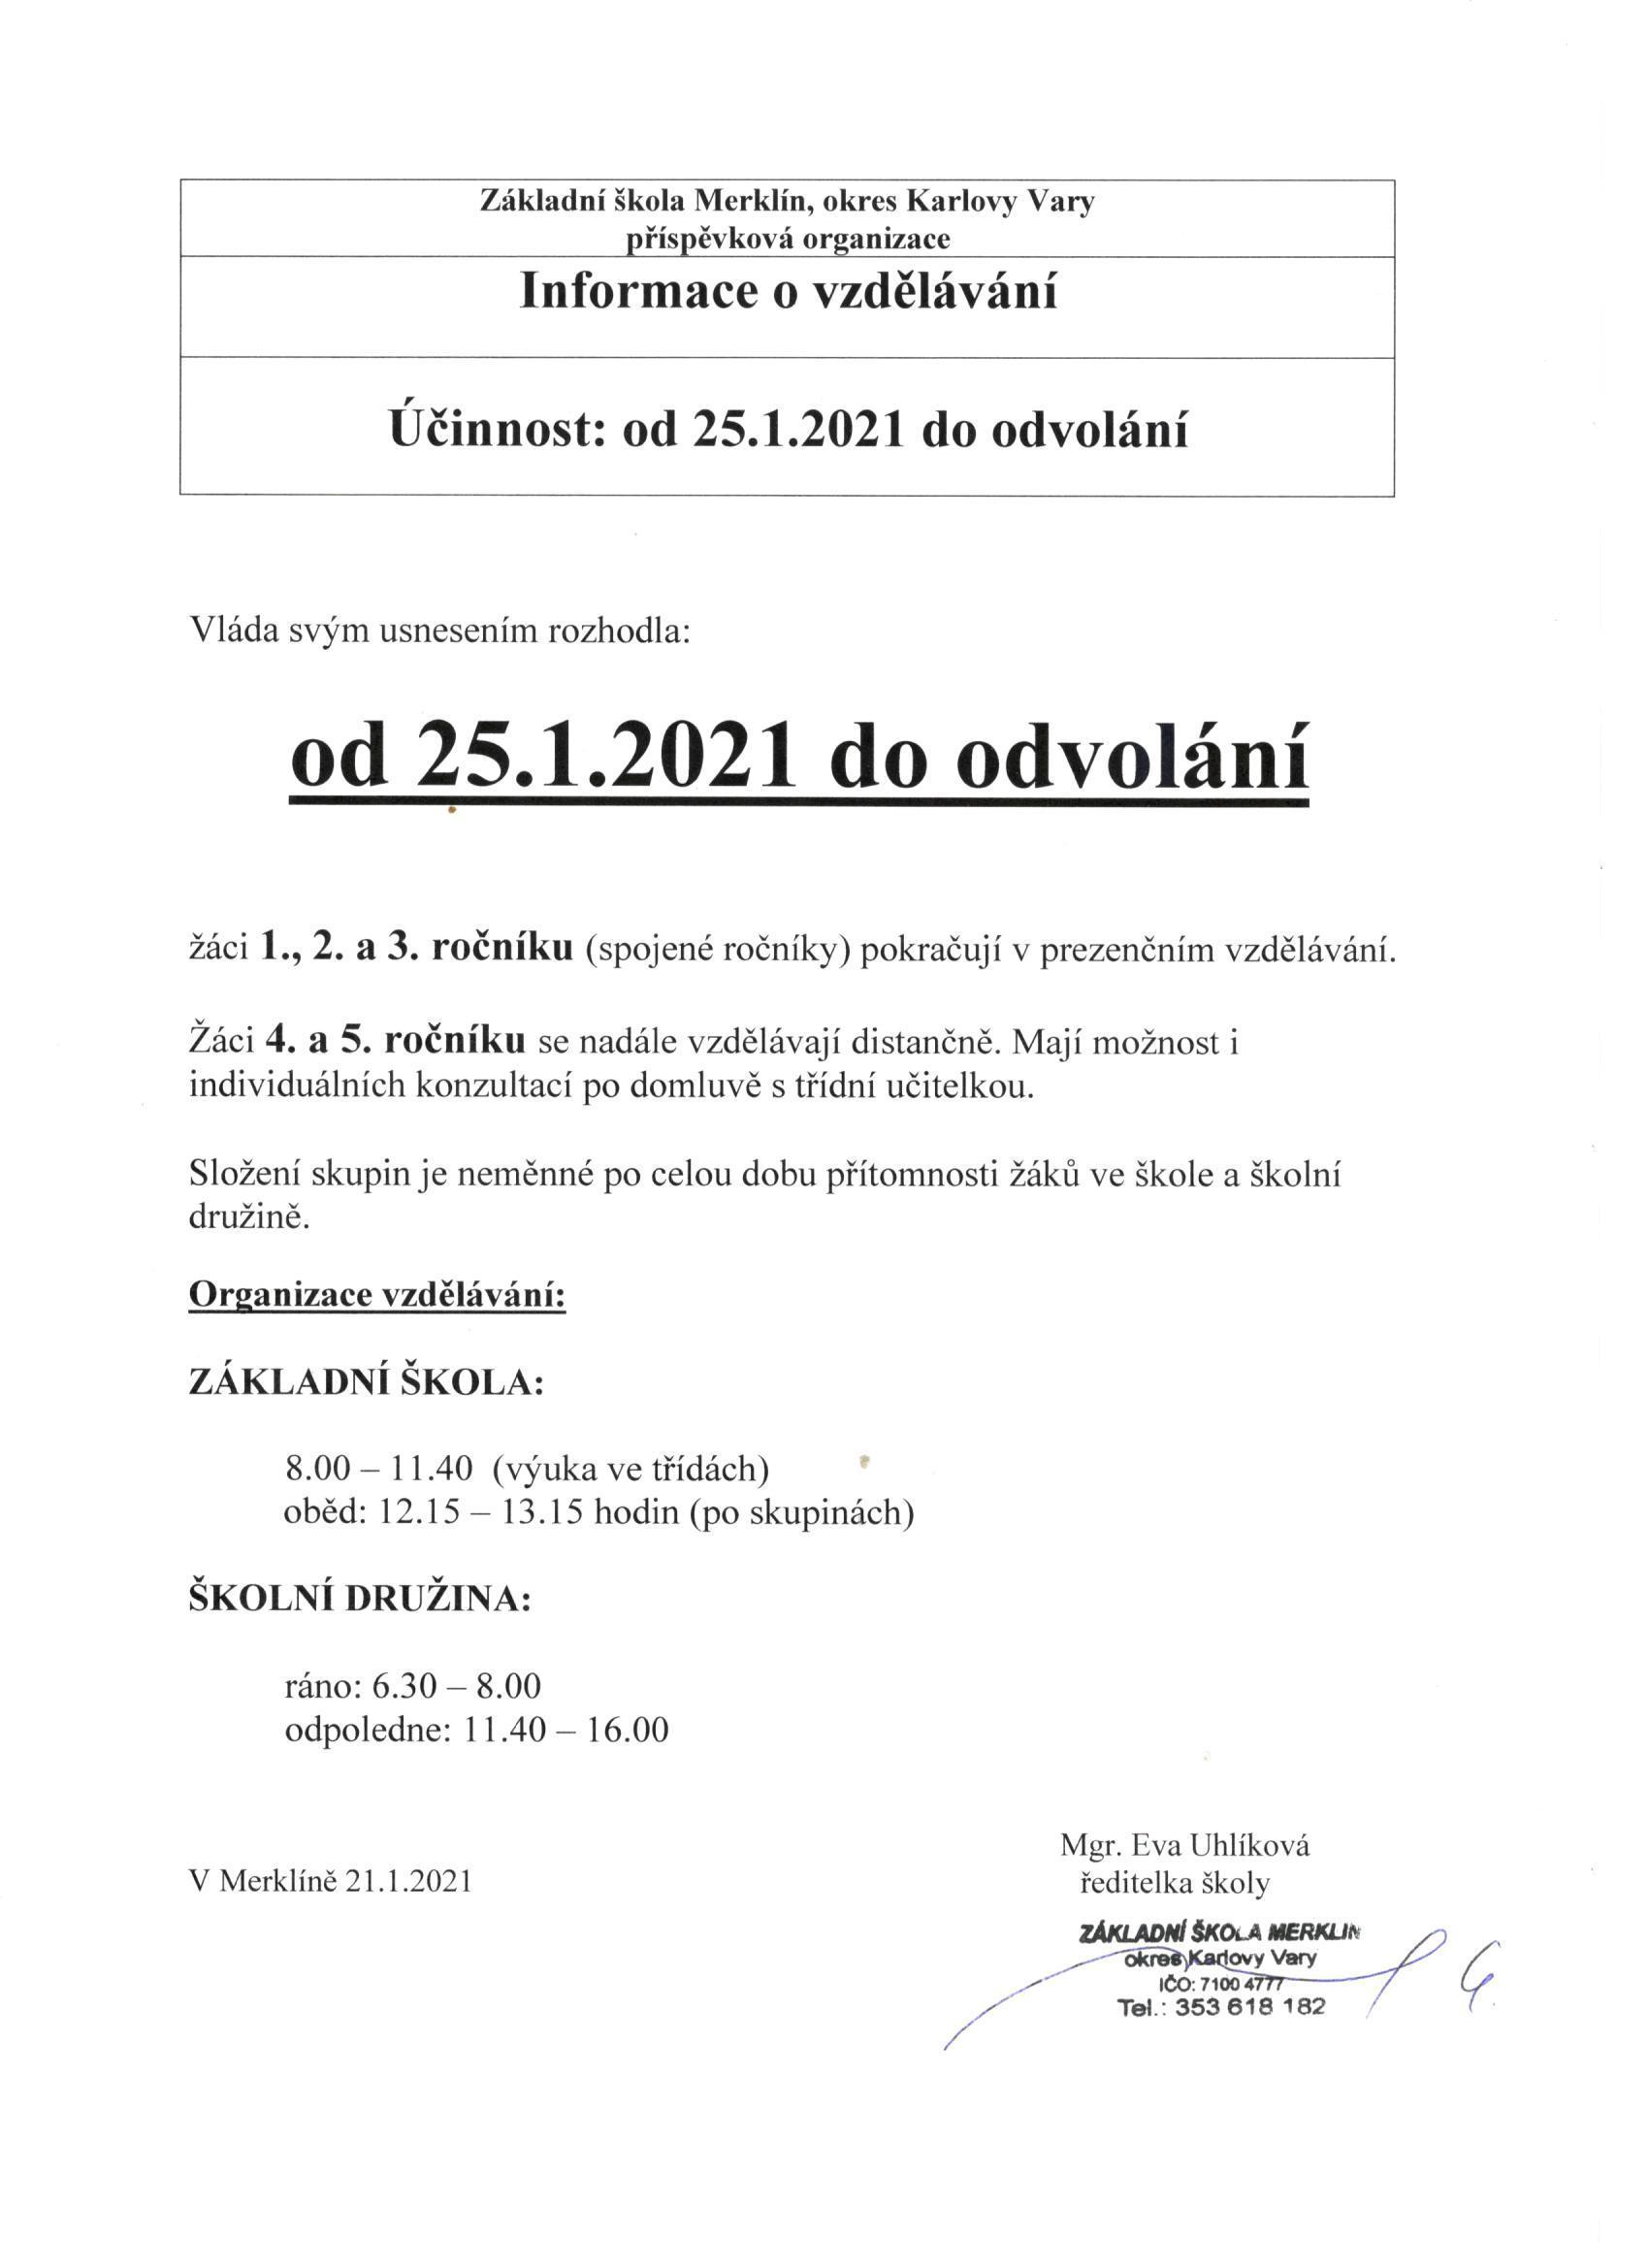 Organizace DV po 25. 1. 2021